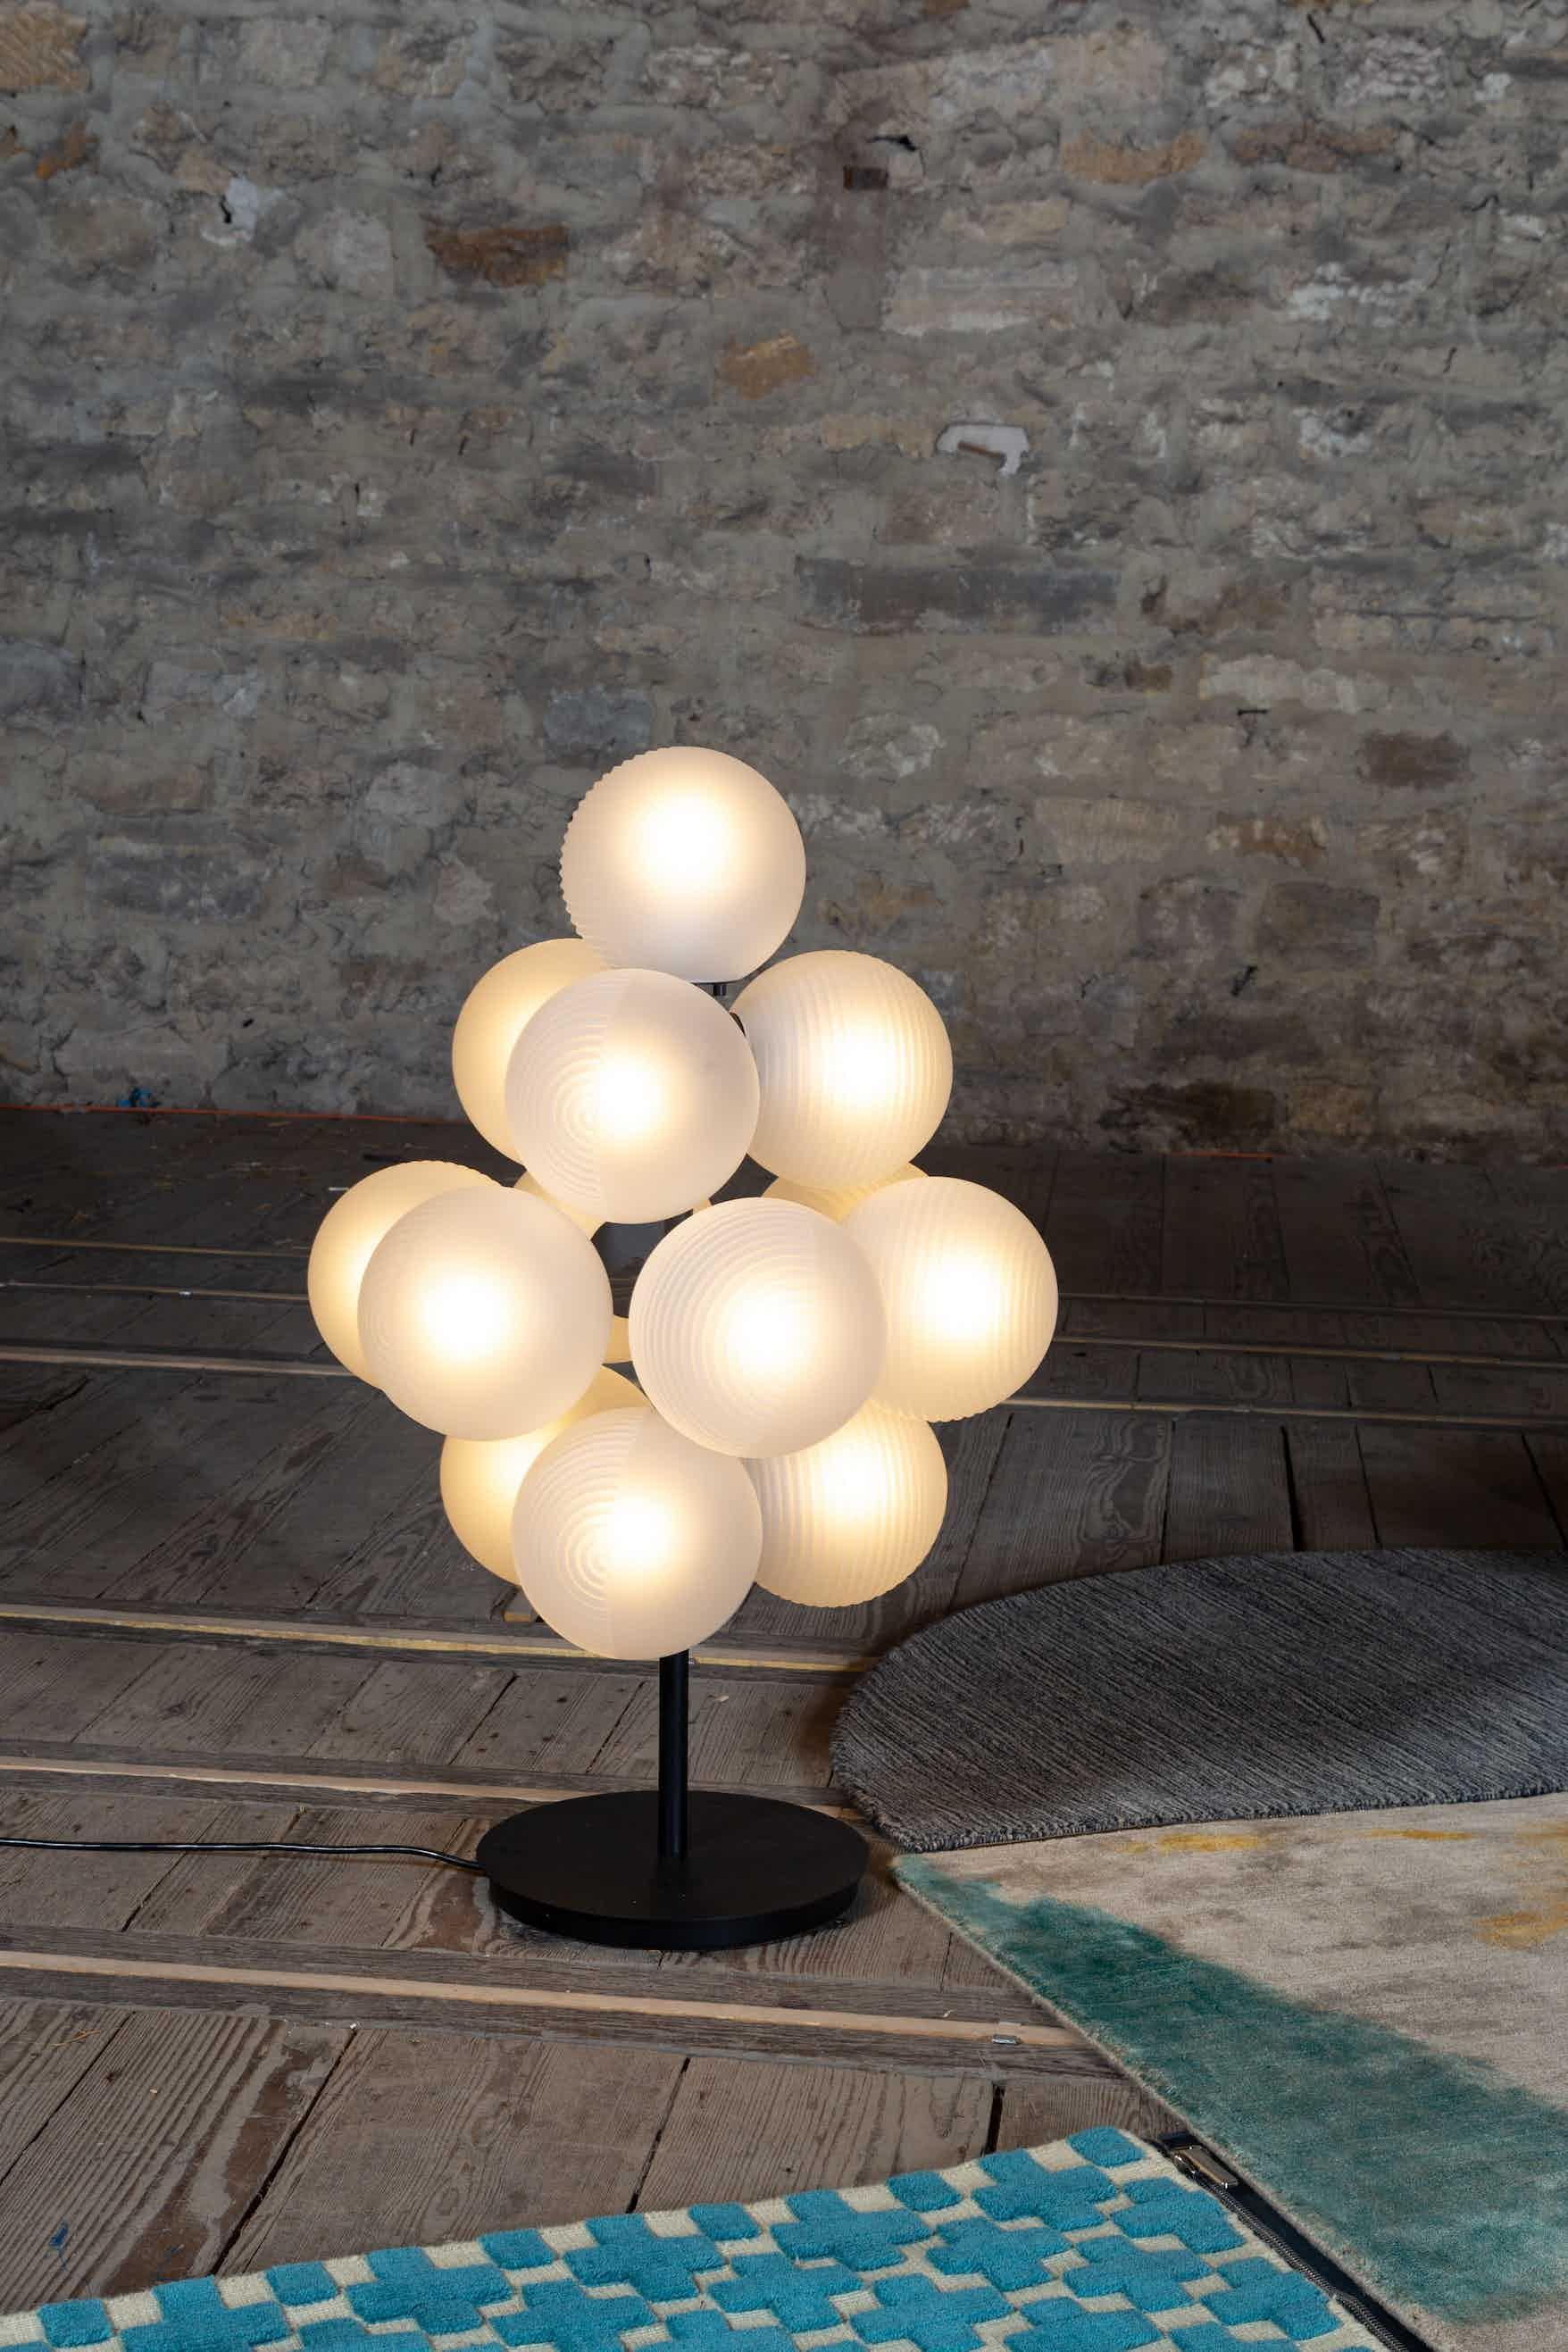 Stellar-grape-lamp-by-pulpo-haute-living